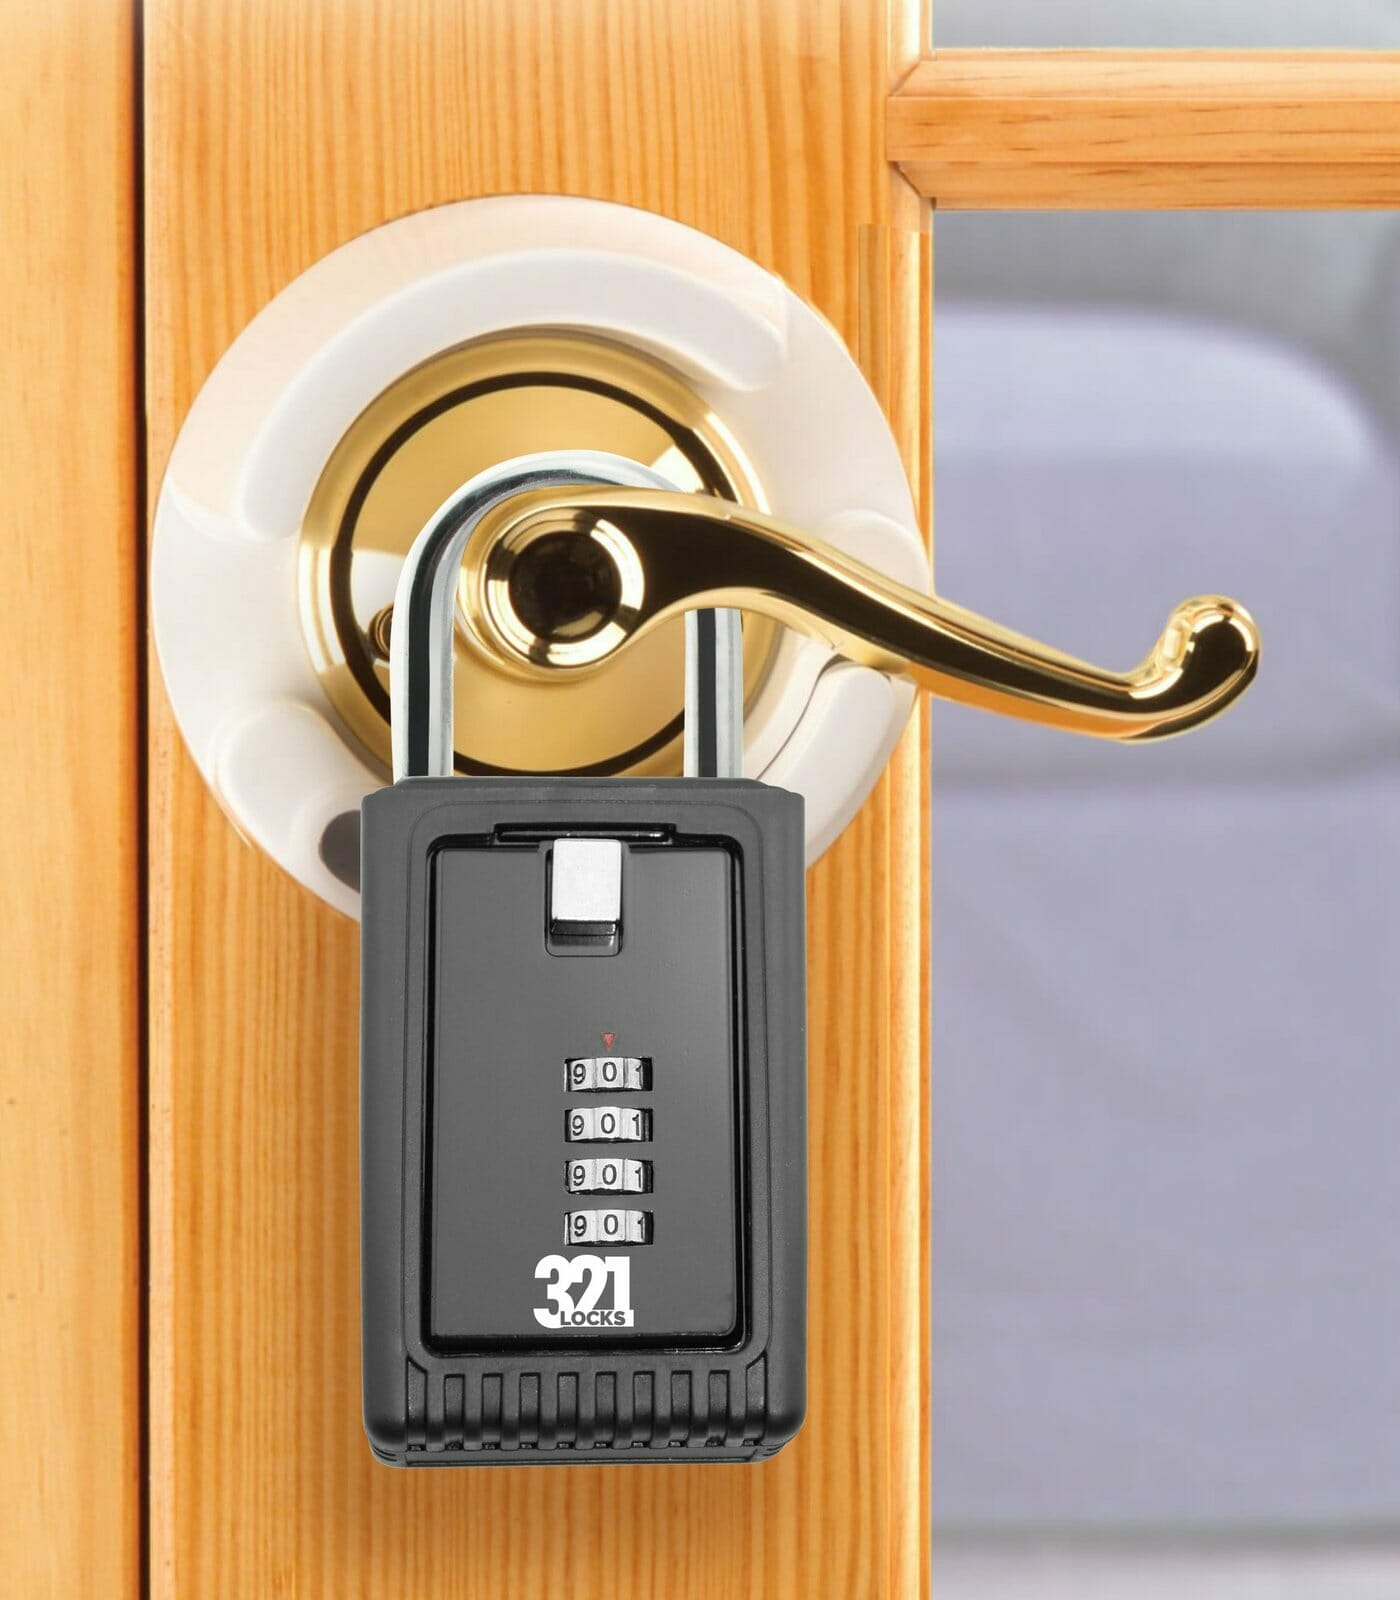 airbnb key service, airbnb key exchange, airbnb key exchange service airbnb keys management, lockbox